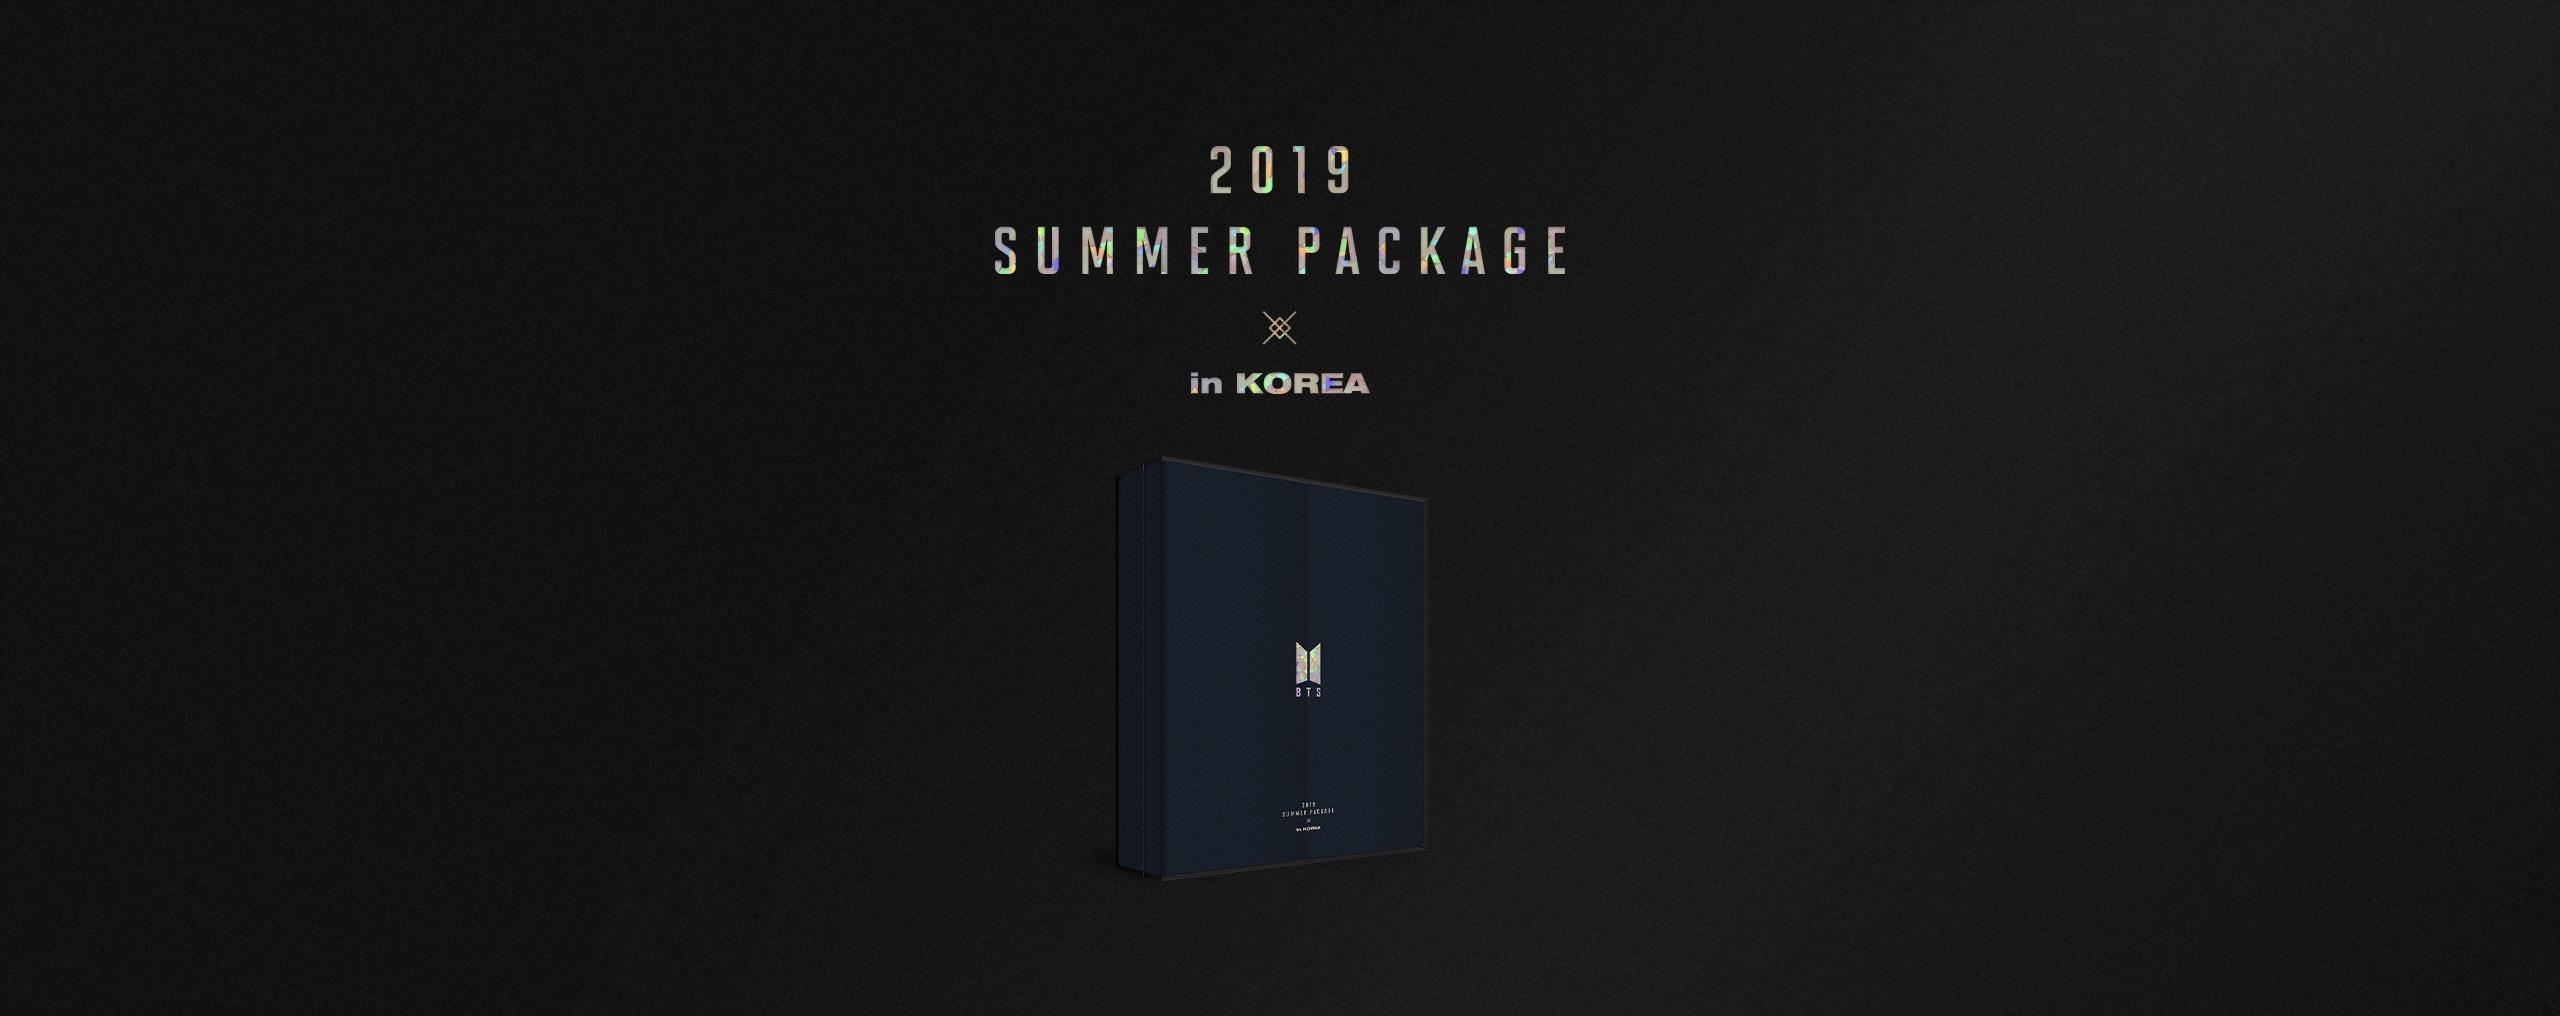 BTS 2019 SUMMER PACKAGE